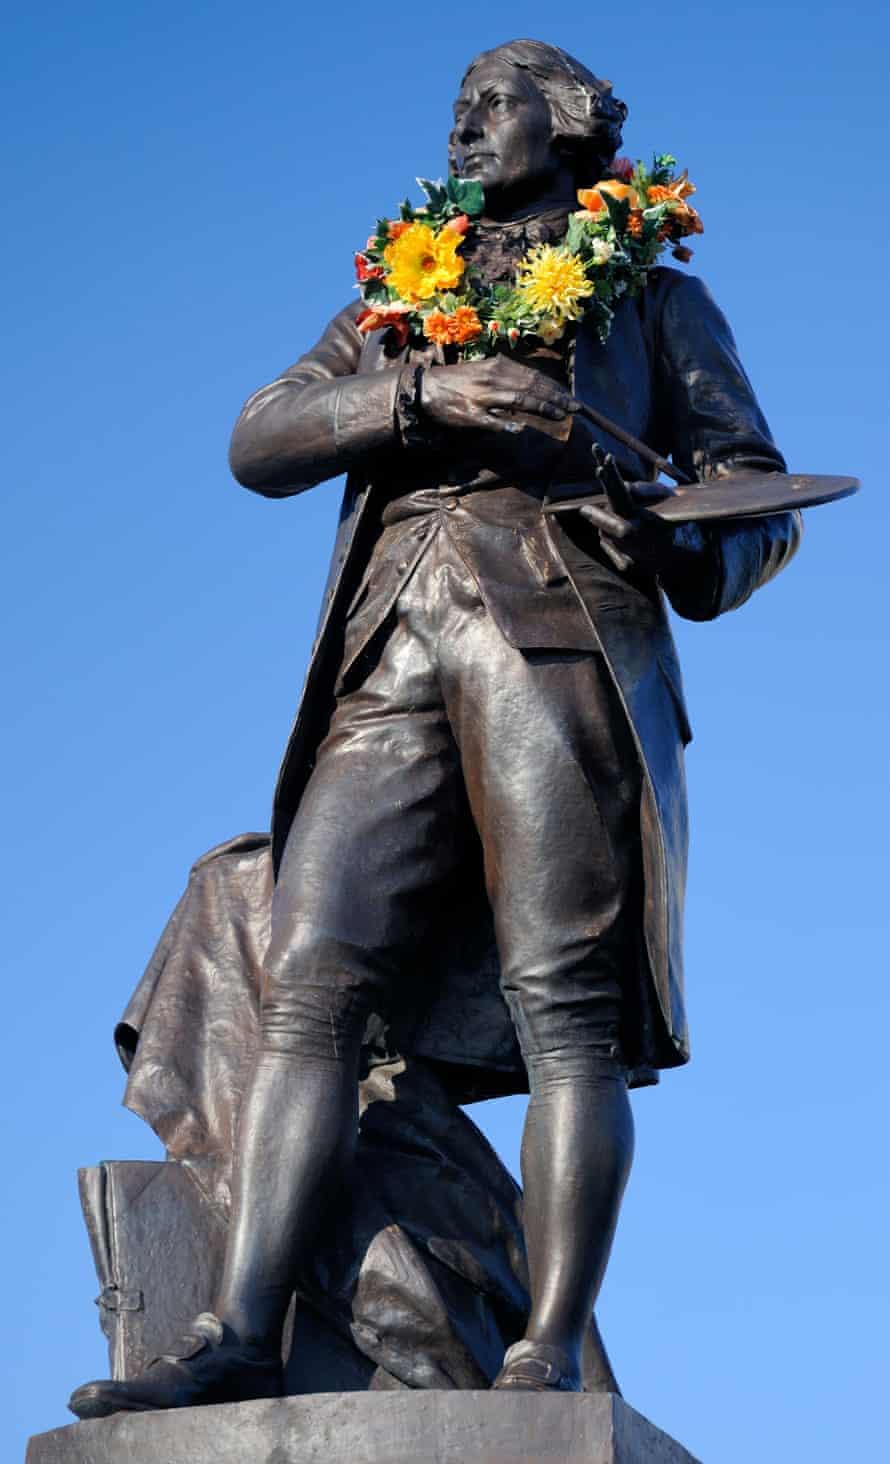 The statue of Thomas Gainsborough in Sudbury, Suffolk.